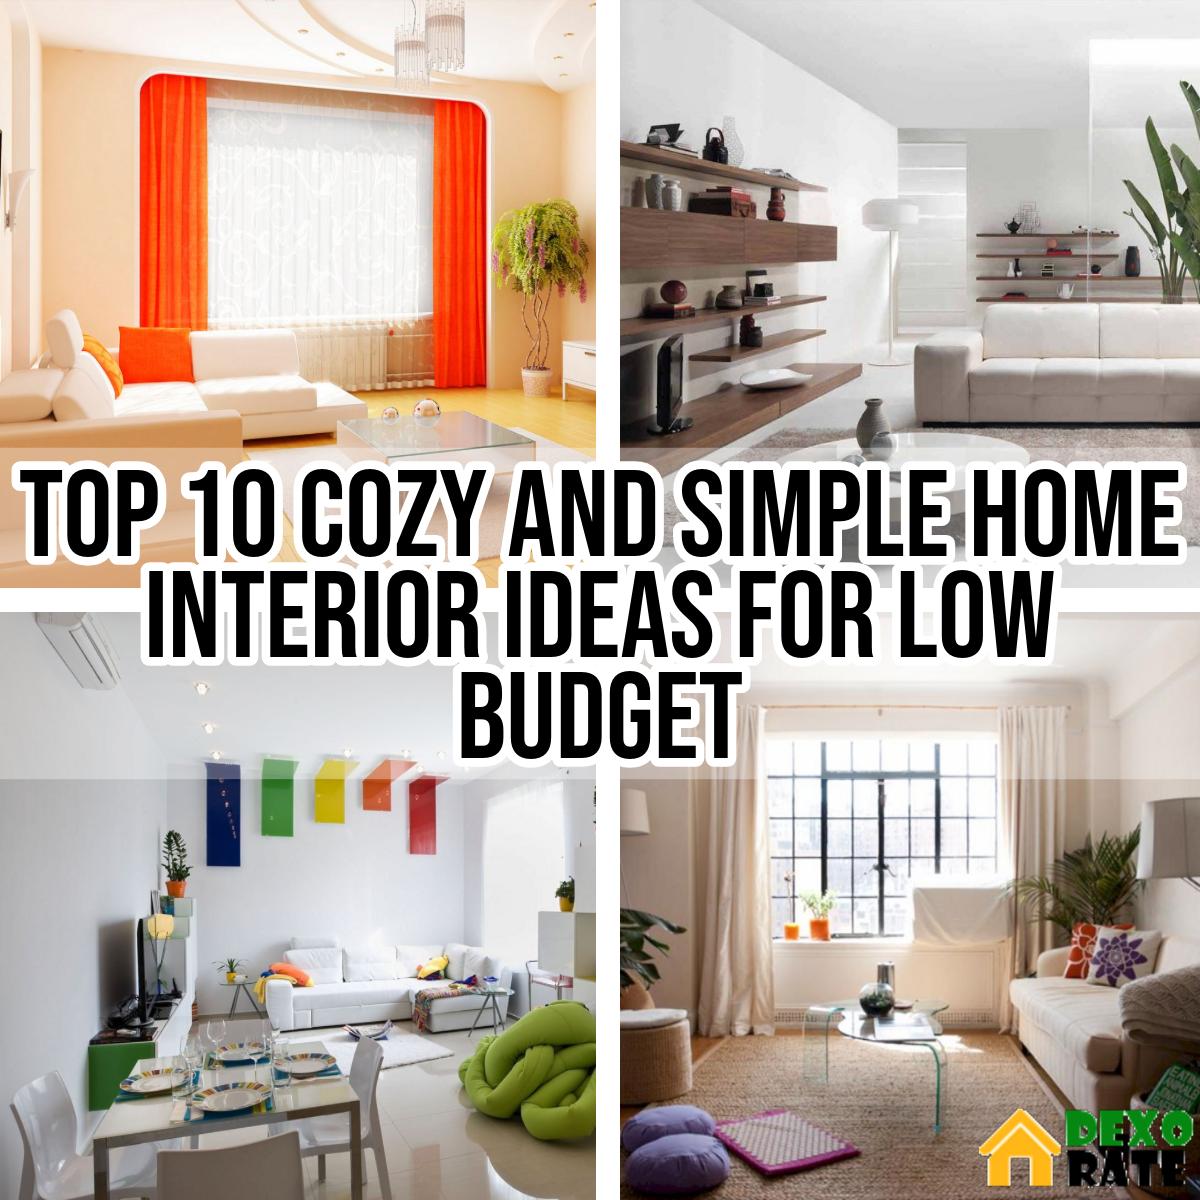 Home Design Ideas Budget: Top 10 Cozy And Simple Home Interior Ideas For Low Budget